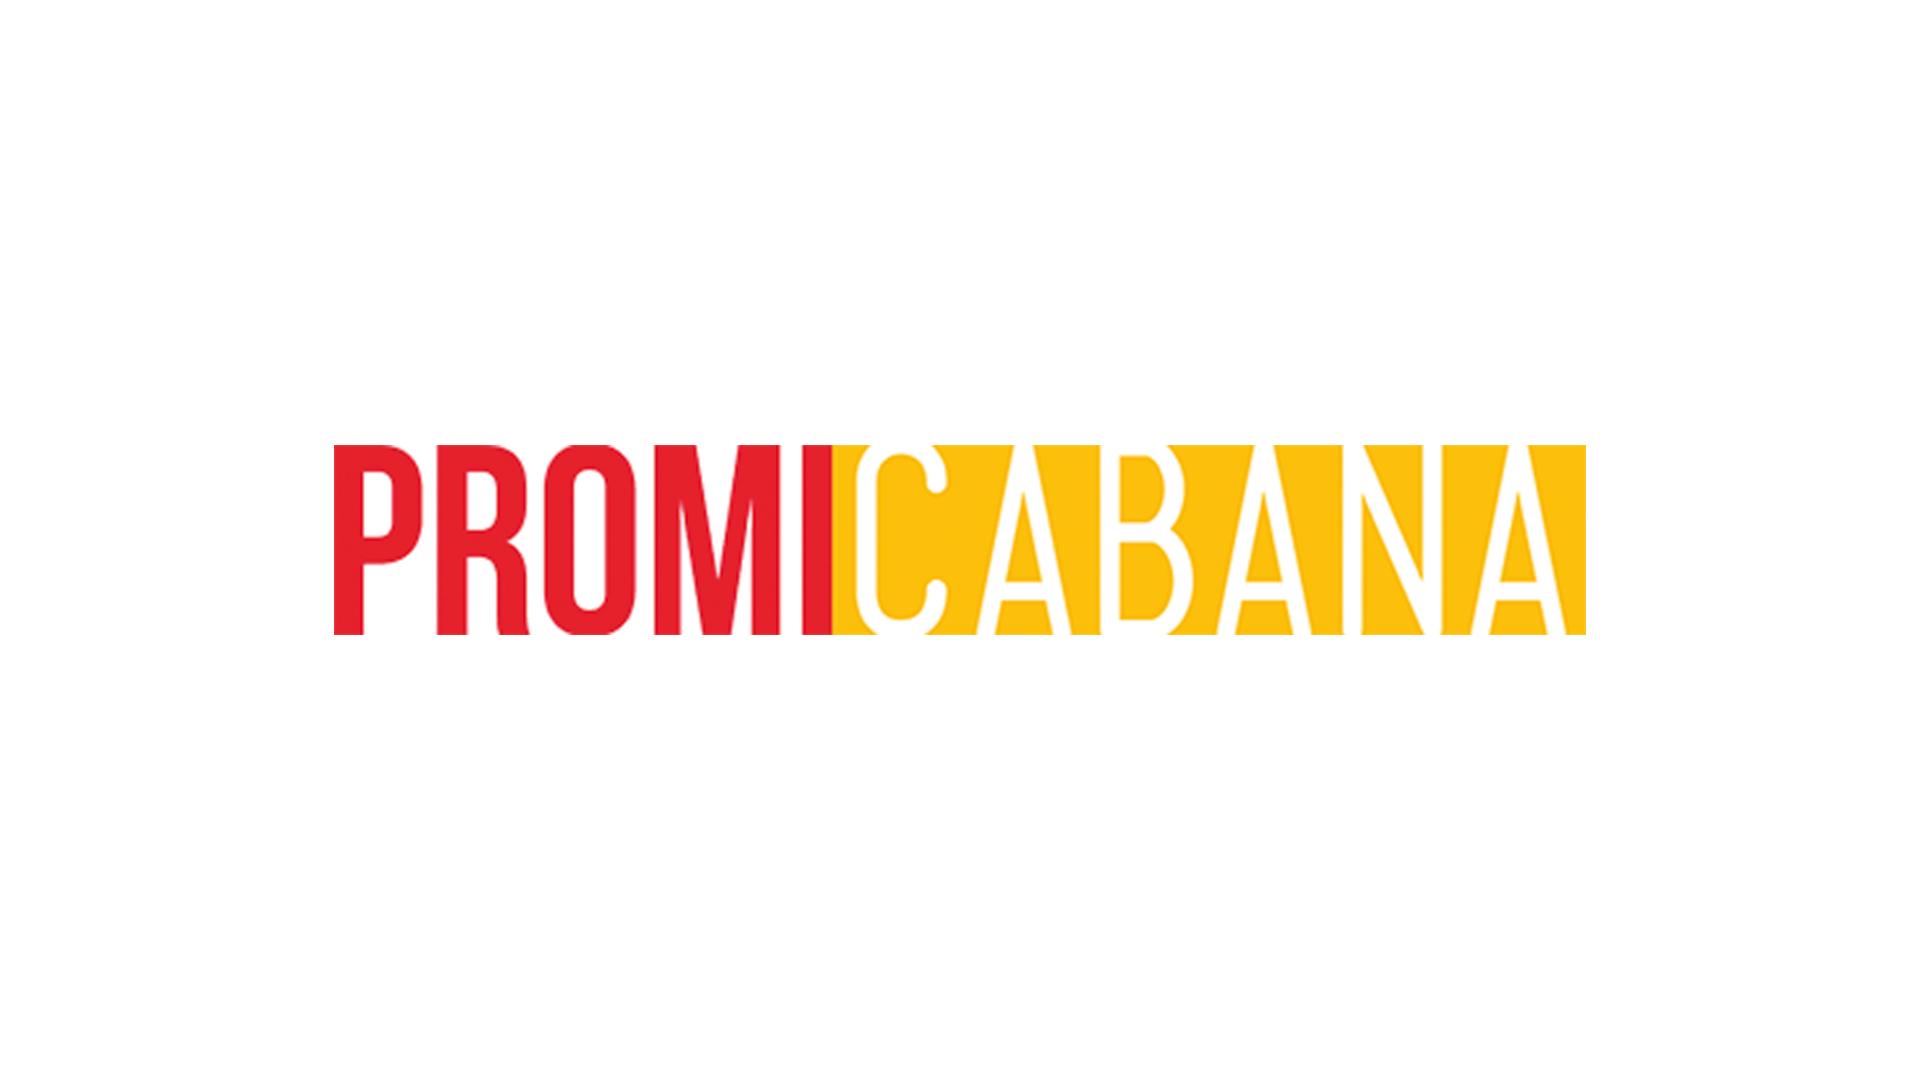 Justin-Bieber-Stache-Believe-Promo